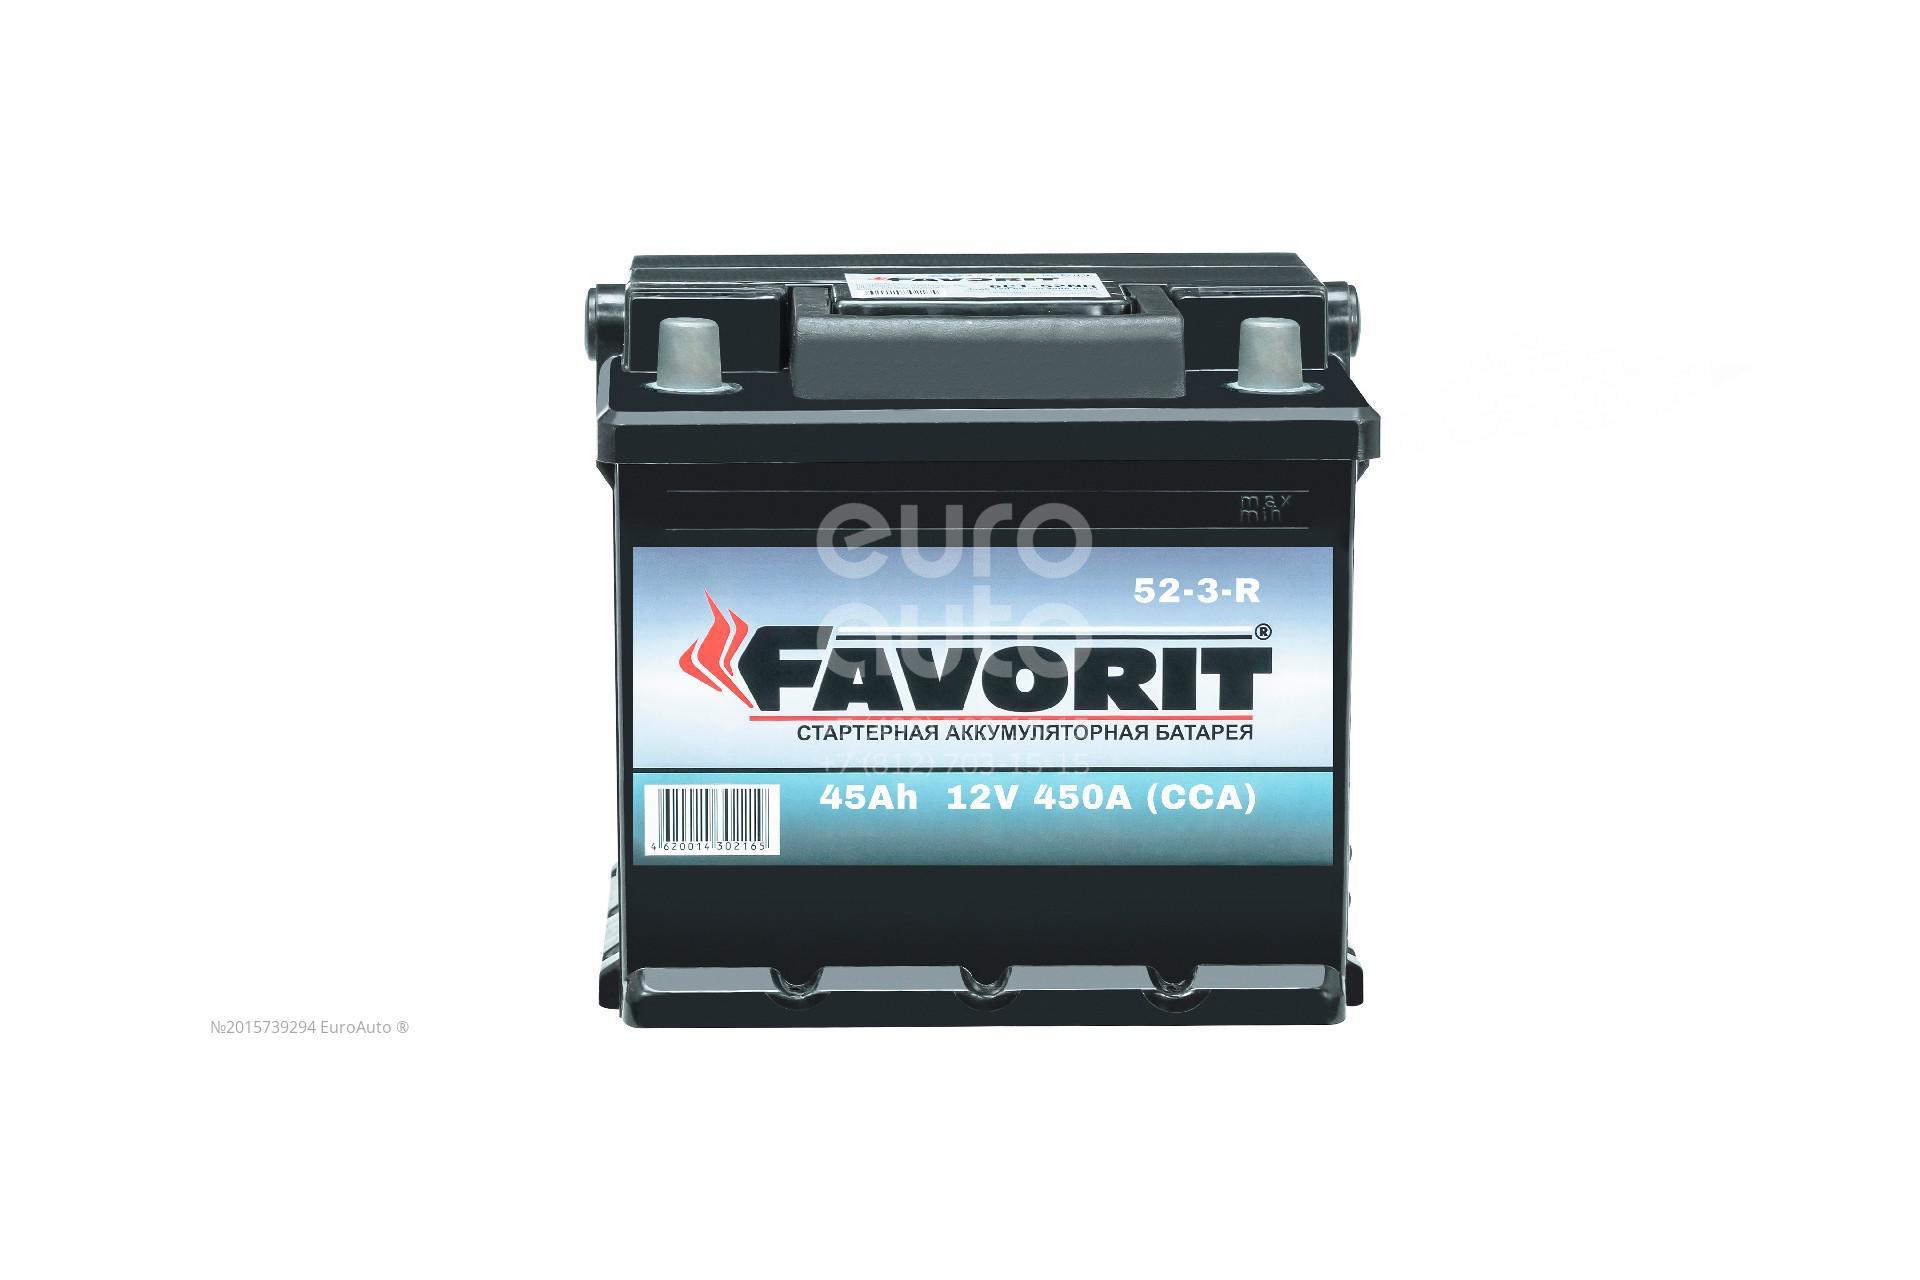 Аккумулятор Favorit 52-3-R